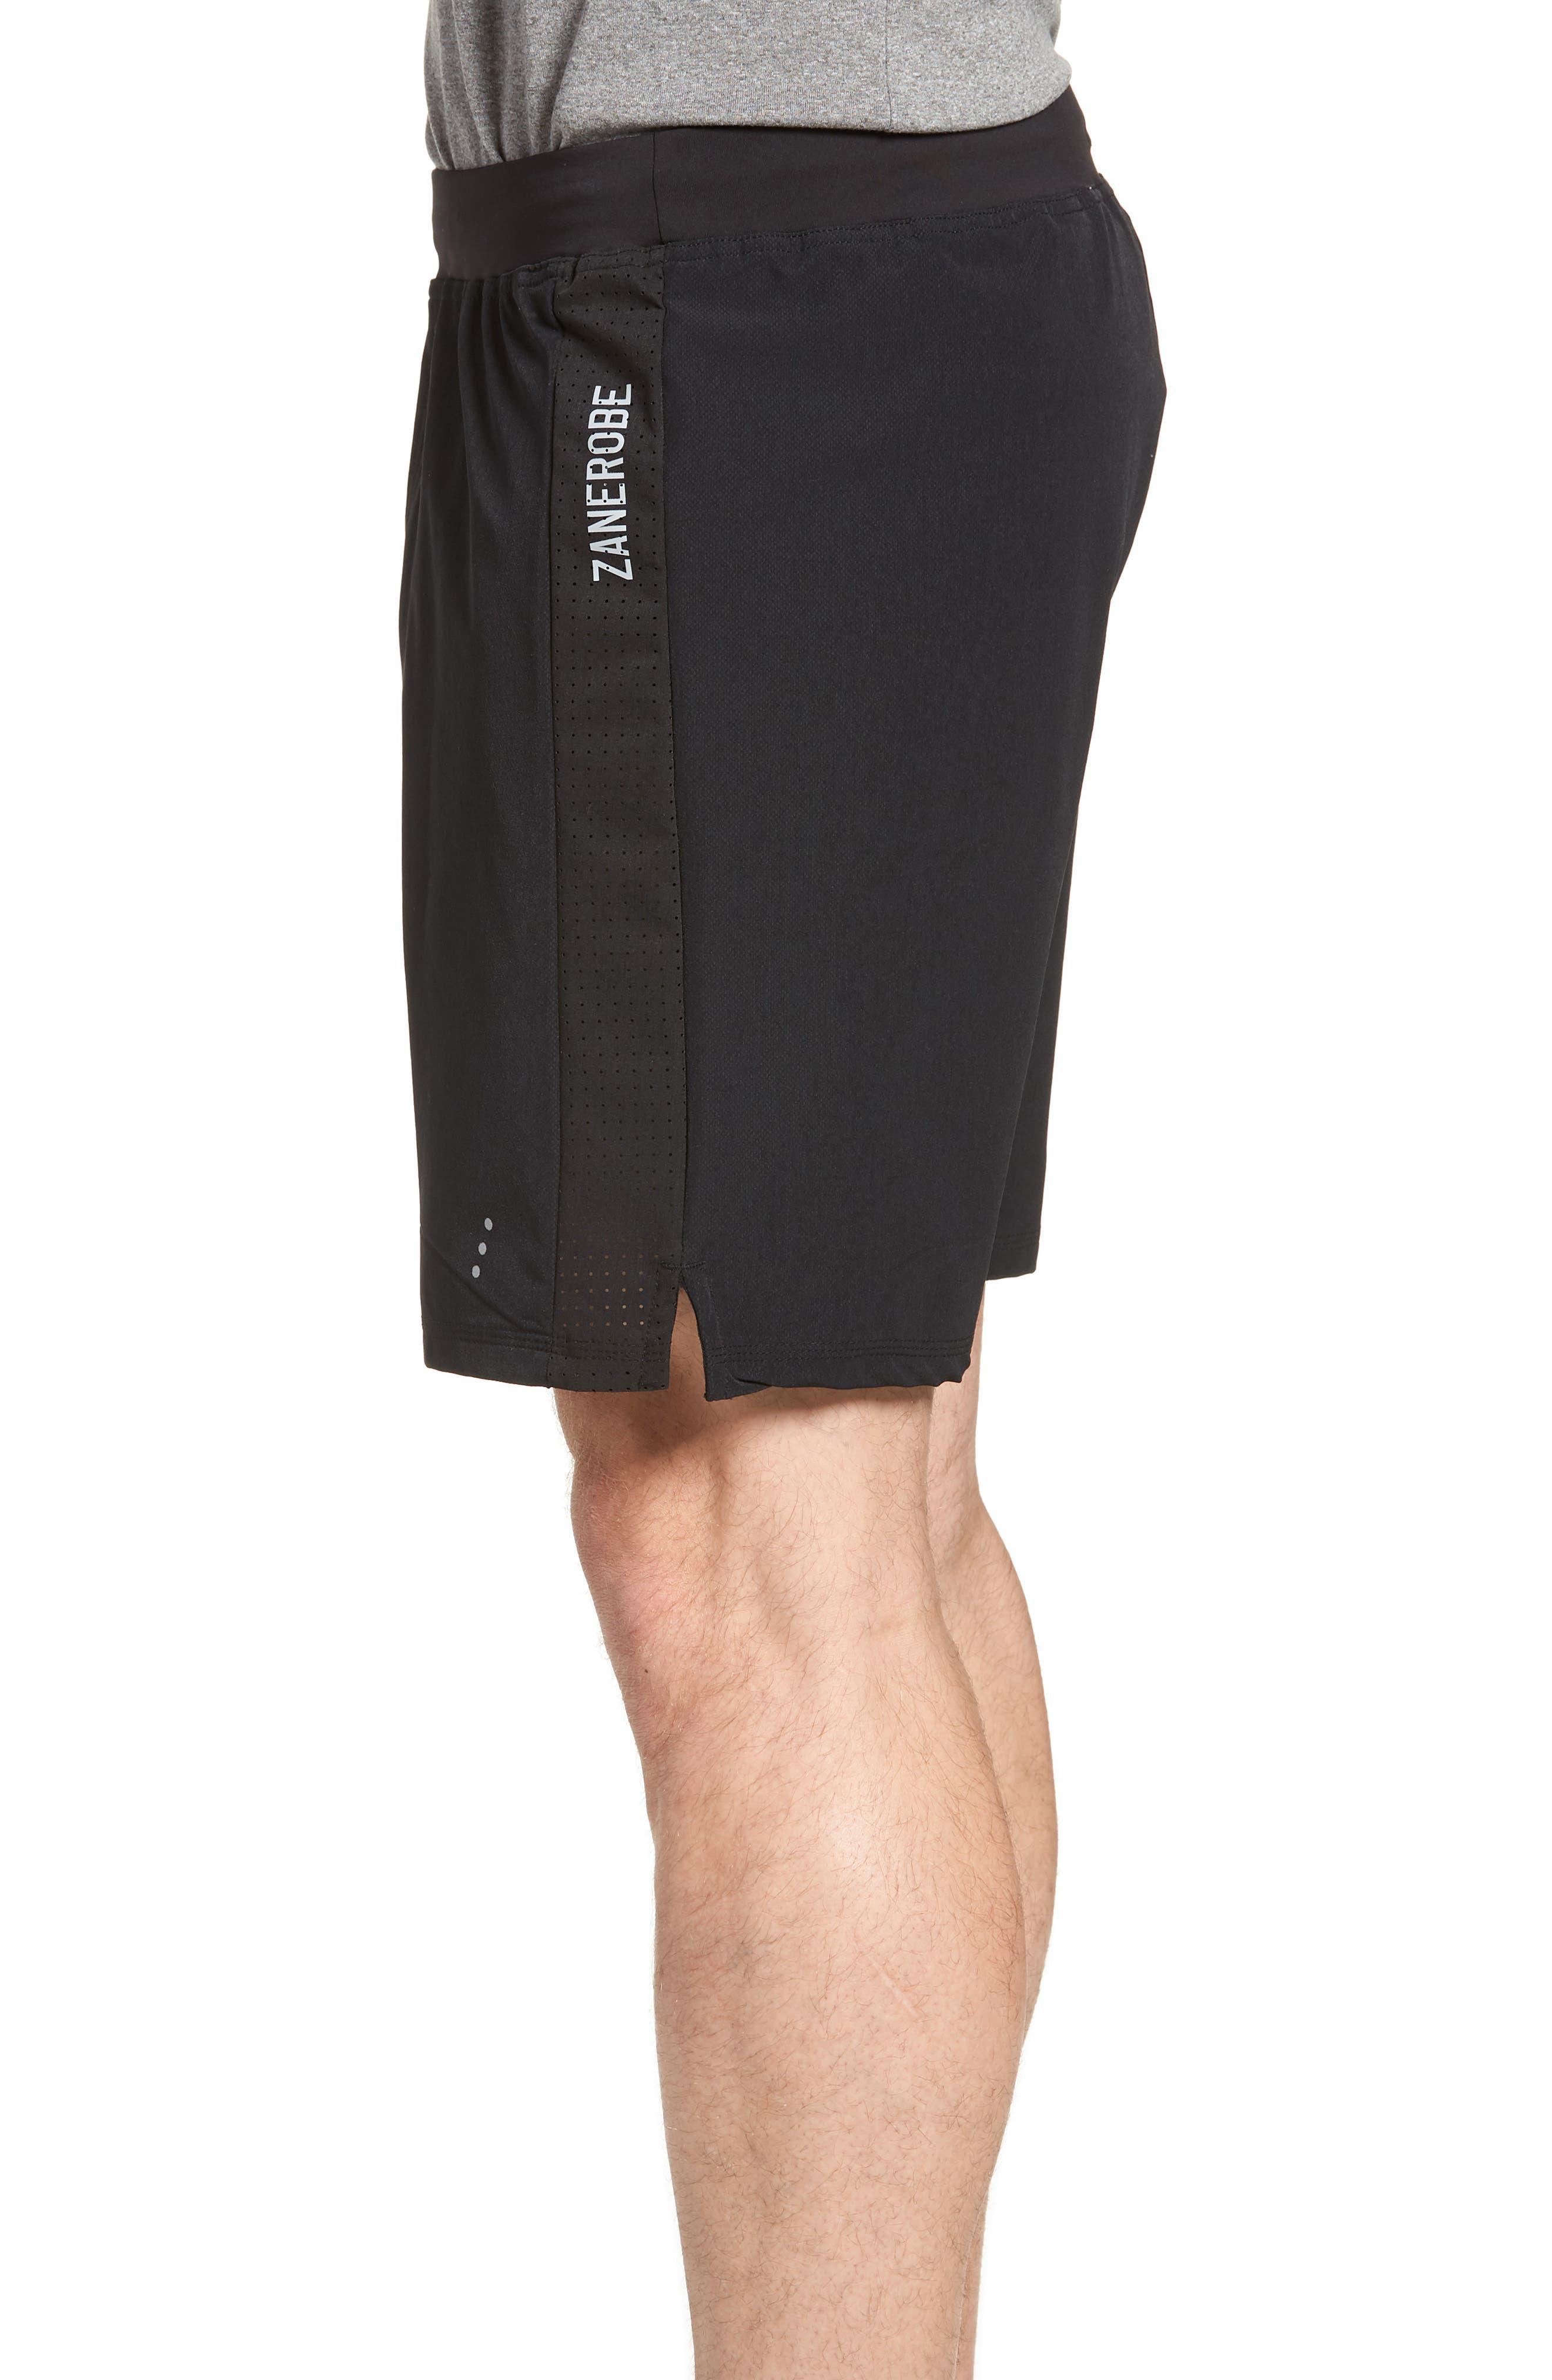 ZANEROBE Type 1 Shorts,                             Alternate thumbnail 4, color,                             Black